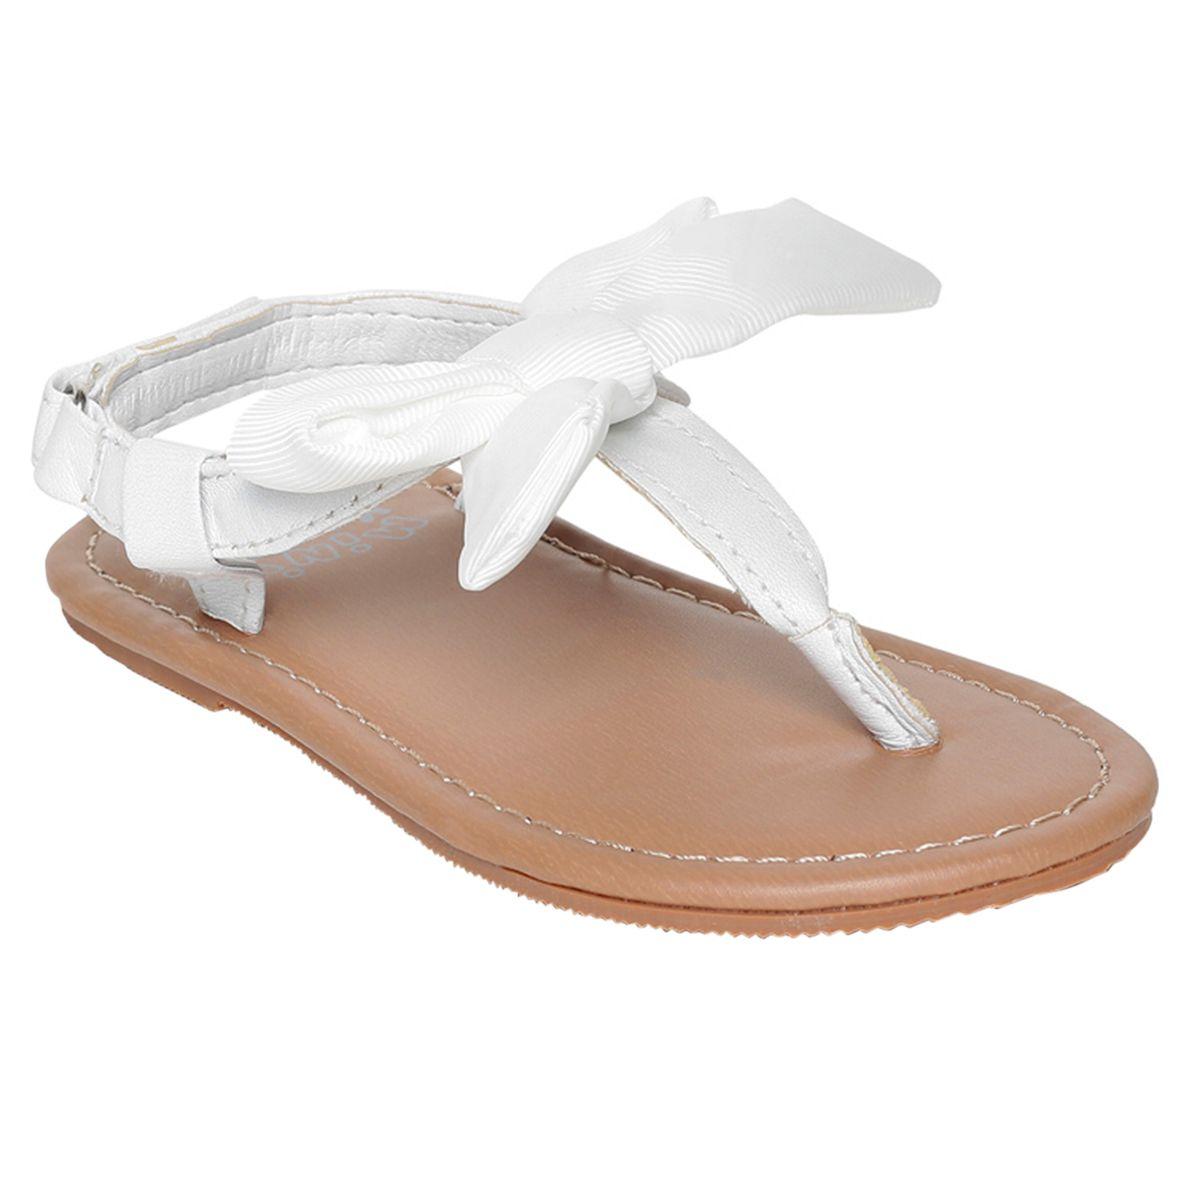 Miniklub Girls White Solid  Hardsole Sandals